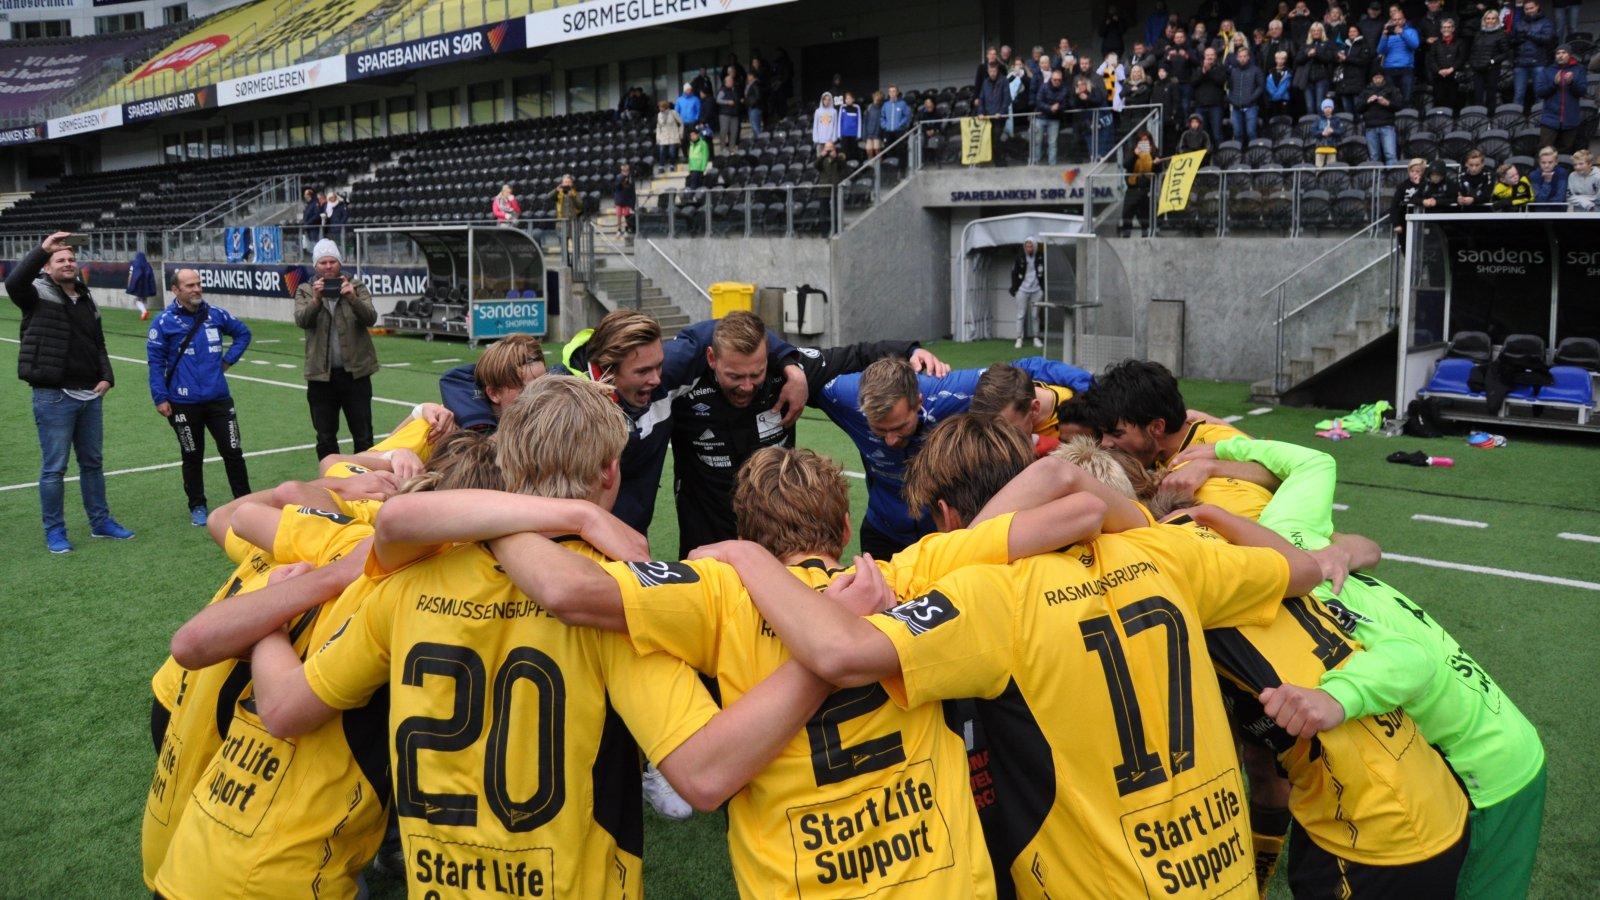 Start g16 - Stabæk G16